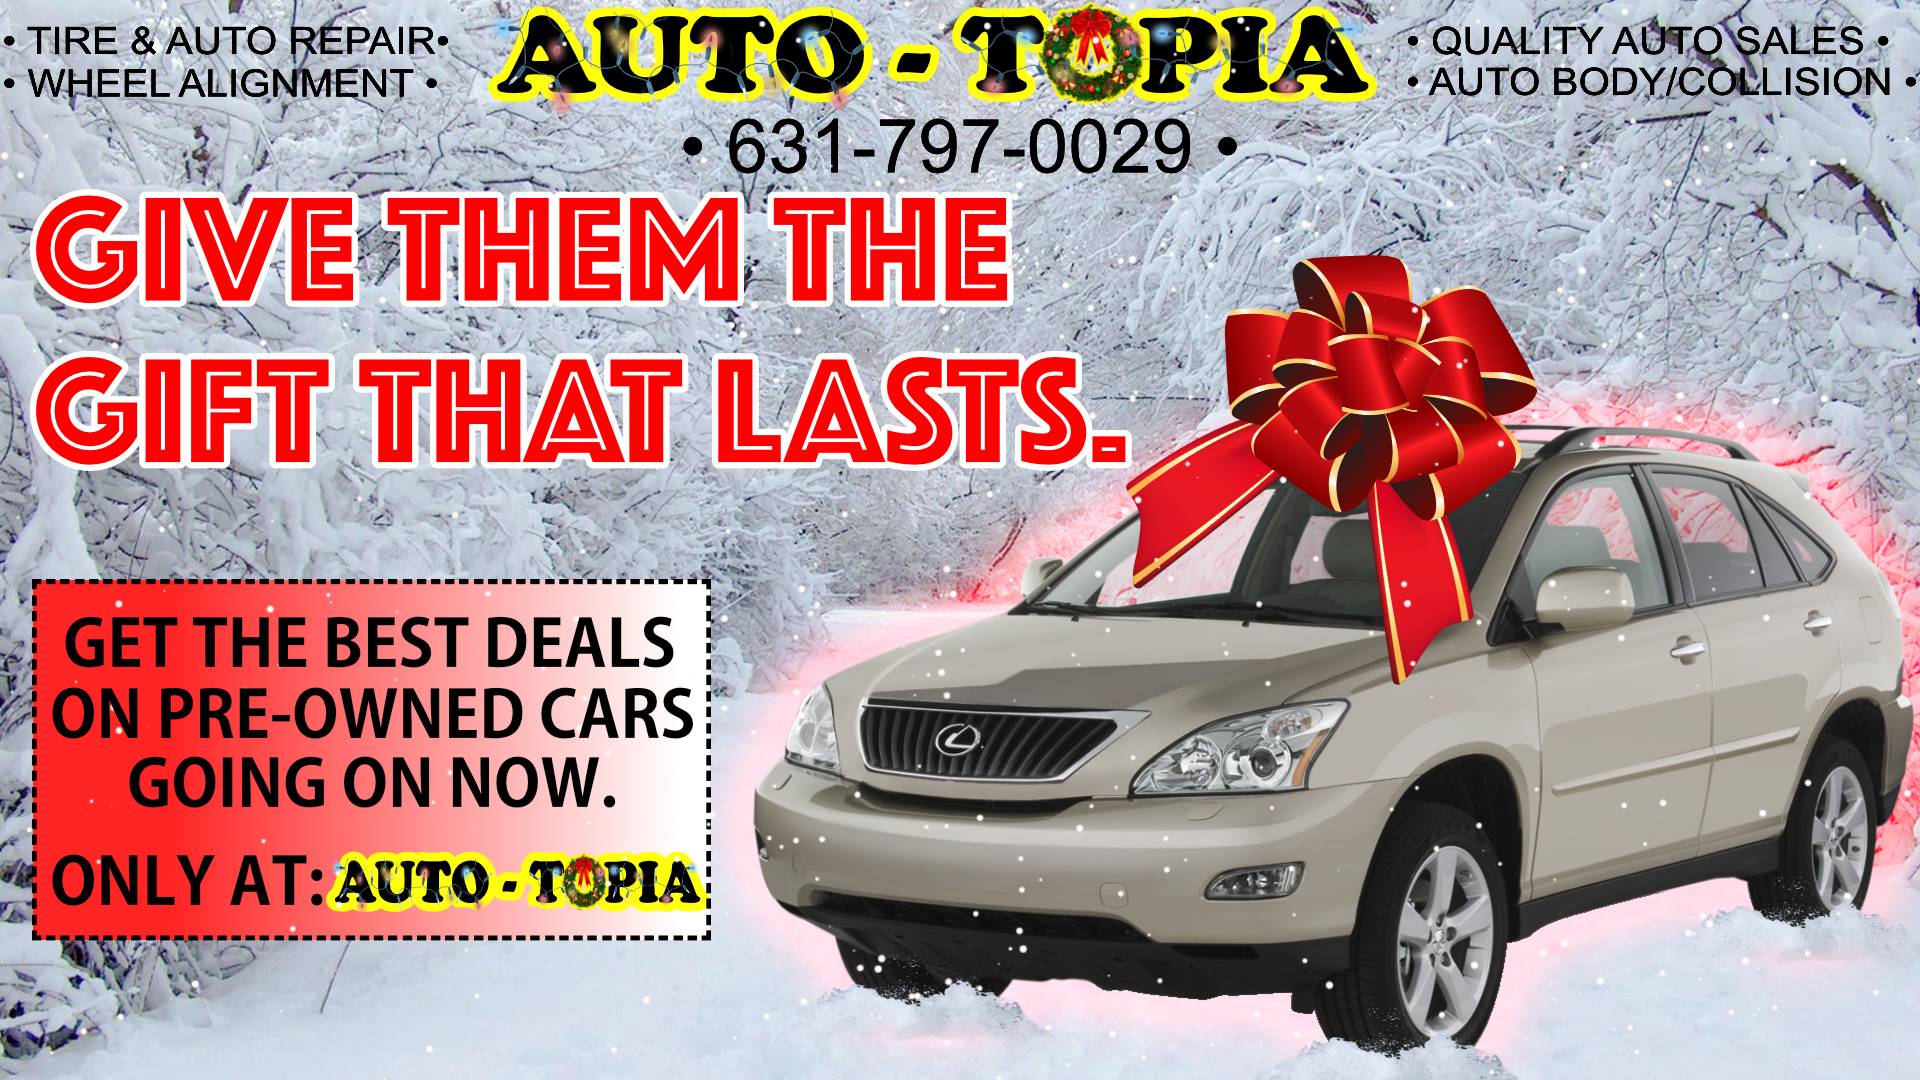 Auto-Topia Christmas Ad